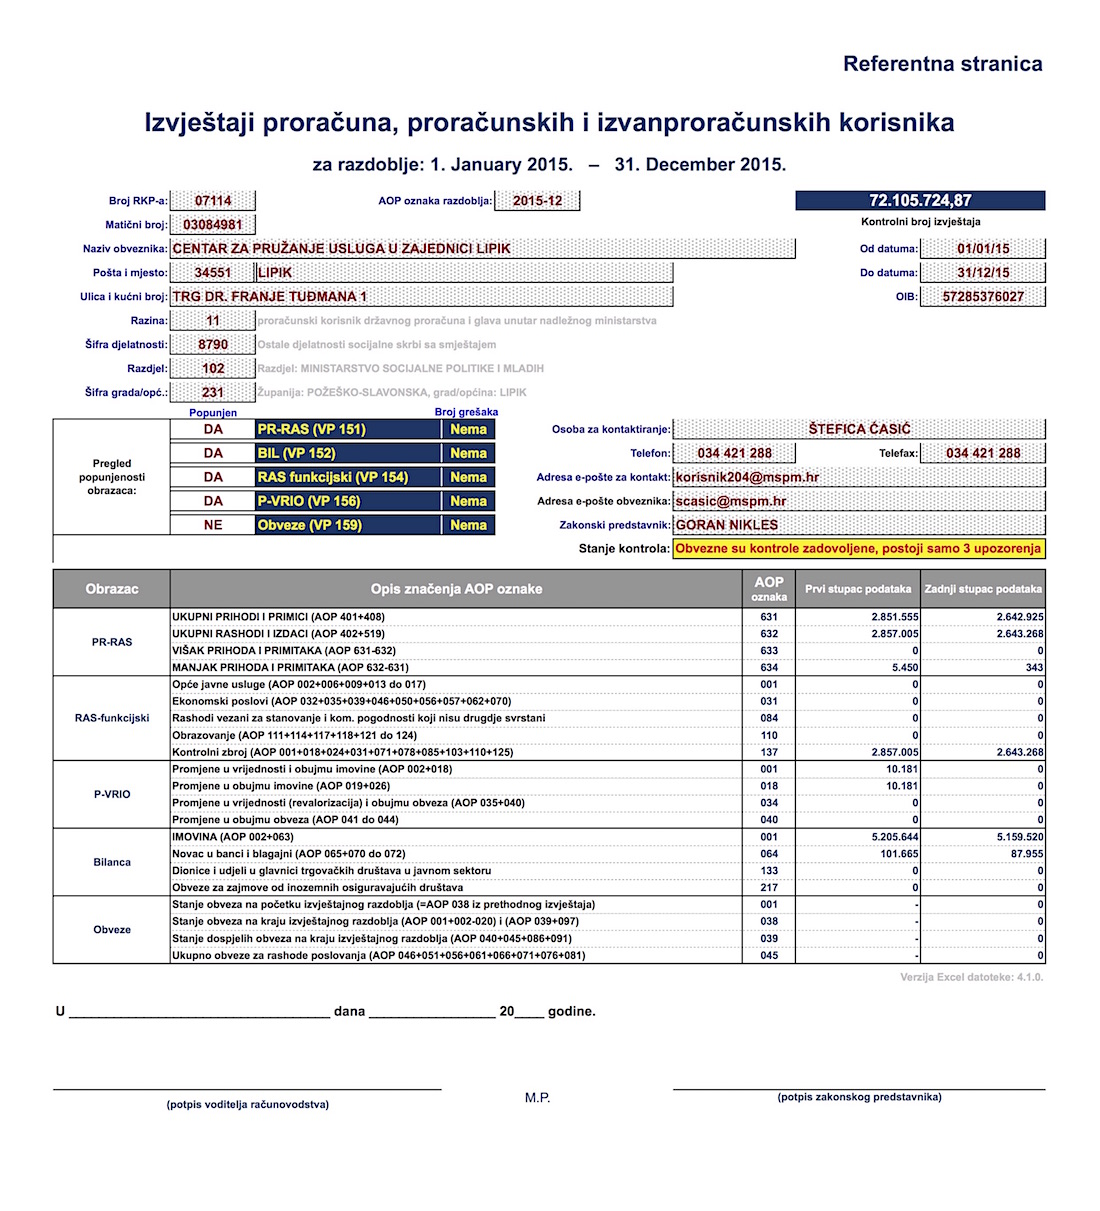 Proracun 2015 - referentna stranica